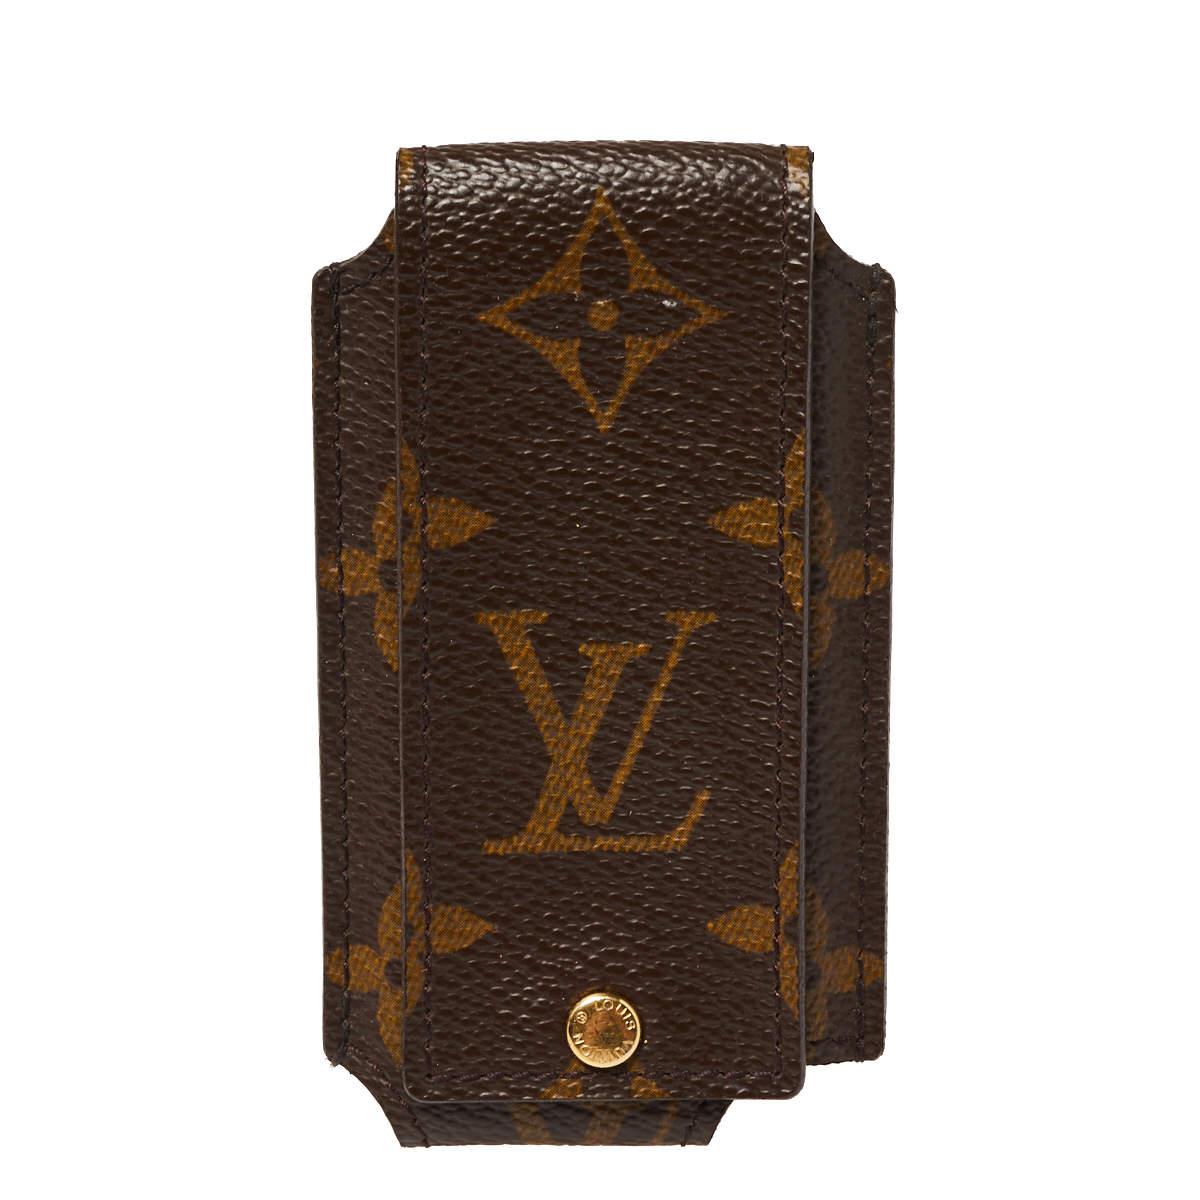 Louis Vuitton Monogram Canvas iPod Nano Case